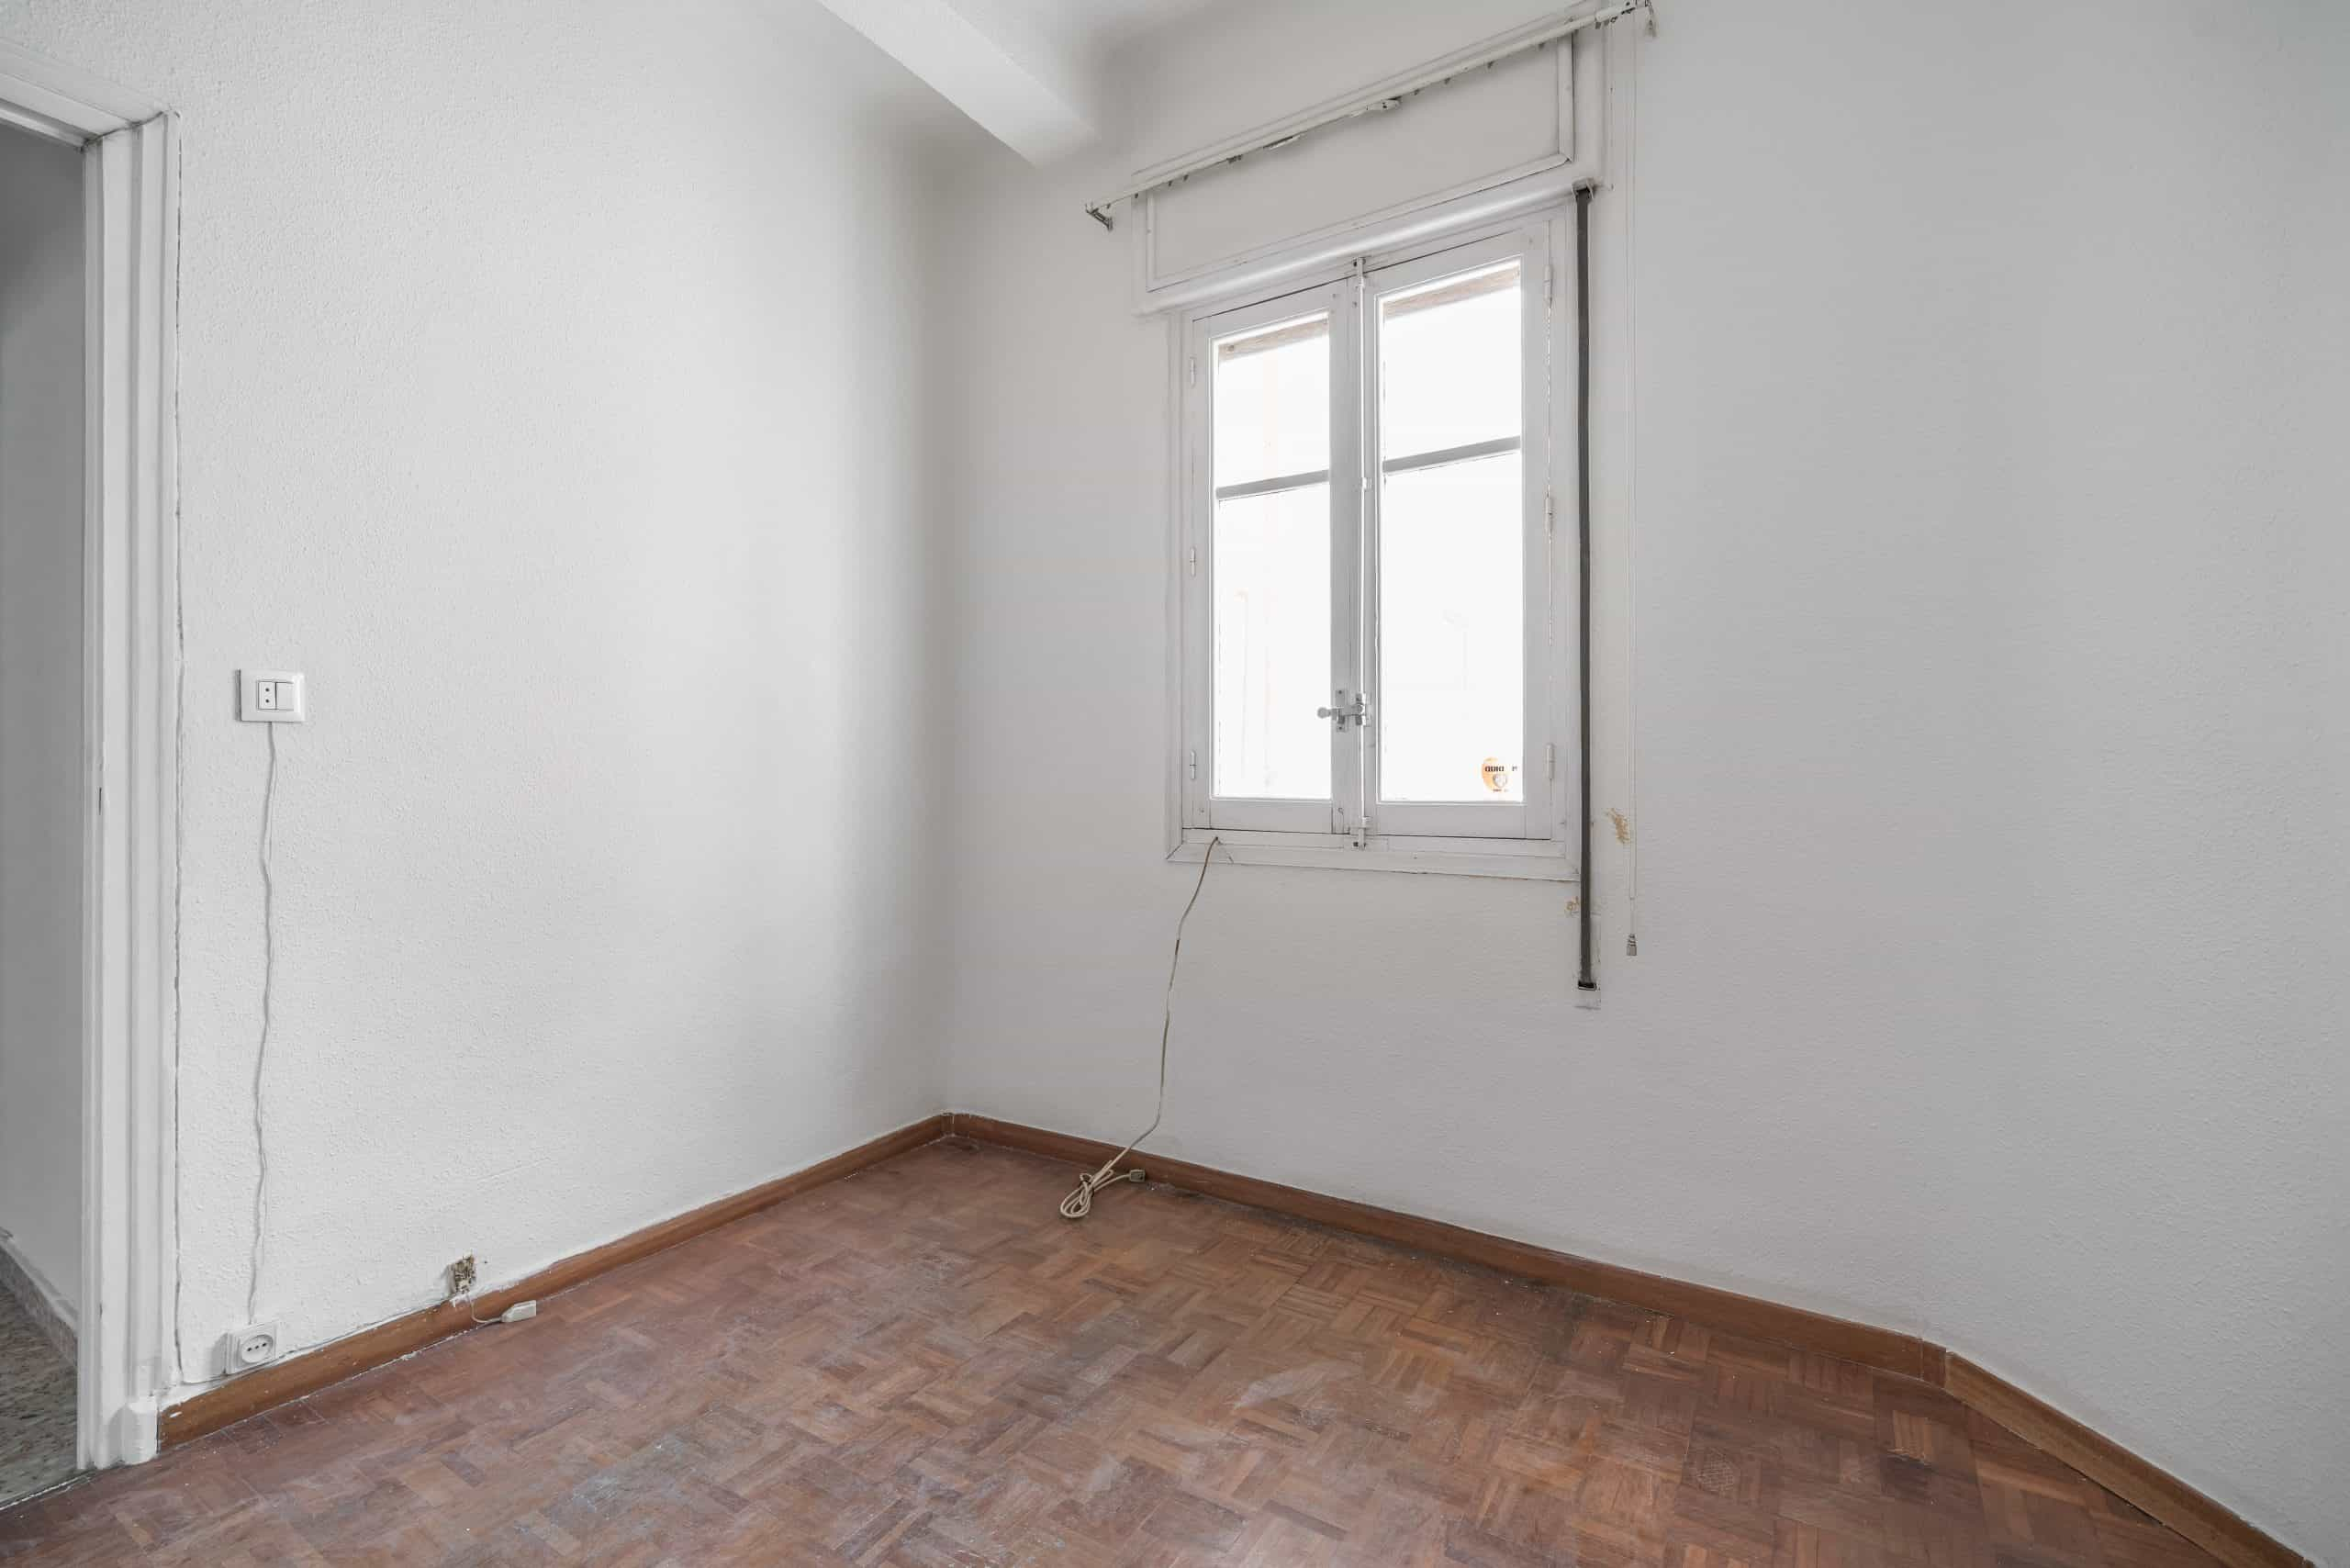 Agencia Inmobiliaria de Madrid-FUTUROCASA-Zona ARGANZUELA-EMBAJADORES-LEGAZPI -calle ALEJANDRO FERRANT -DORMITORIO3-1